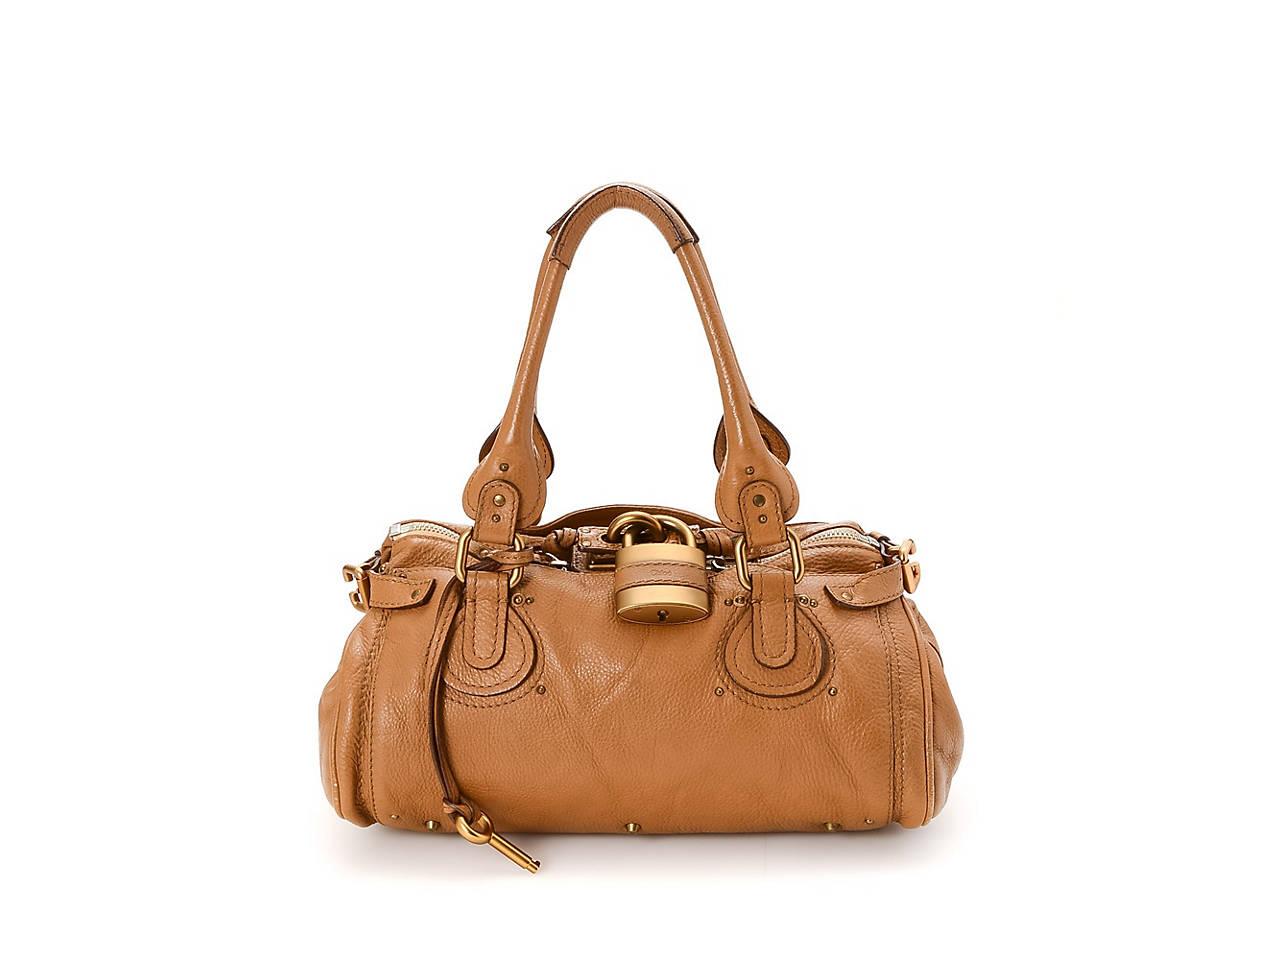 93361fe56752 Chloe - Vintage Luxury Paddington Leather Shoulder Bag Women s ...